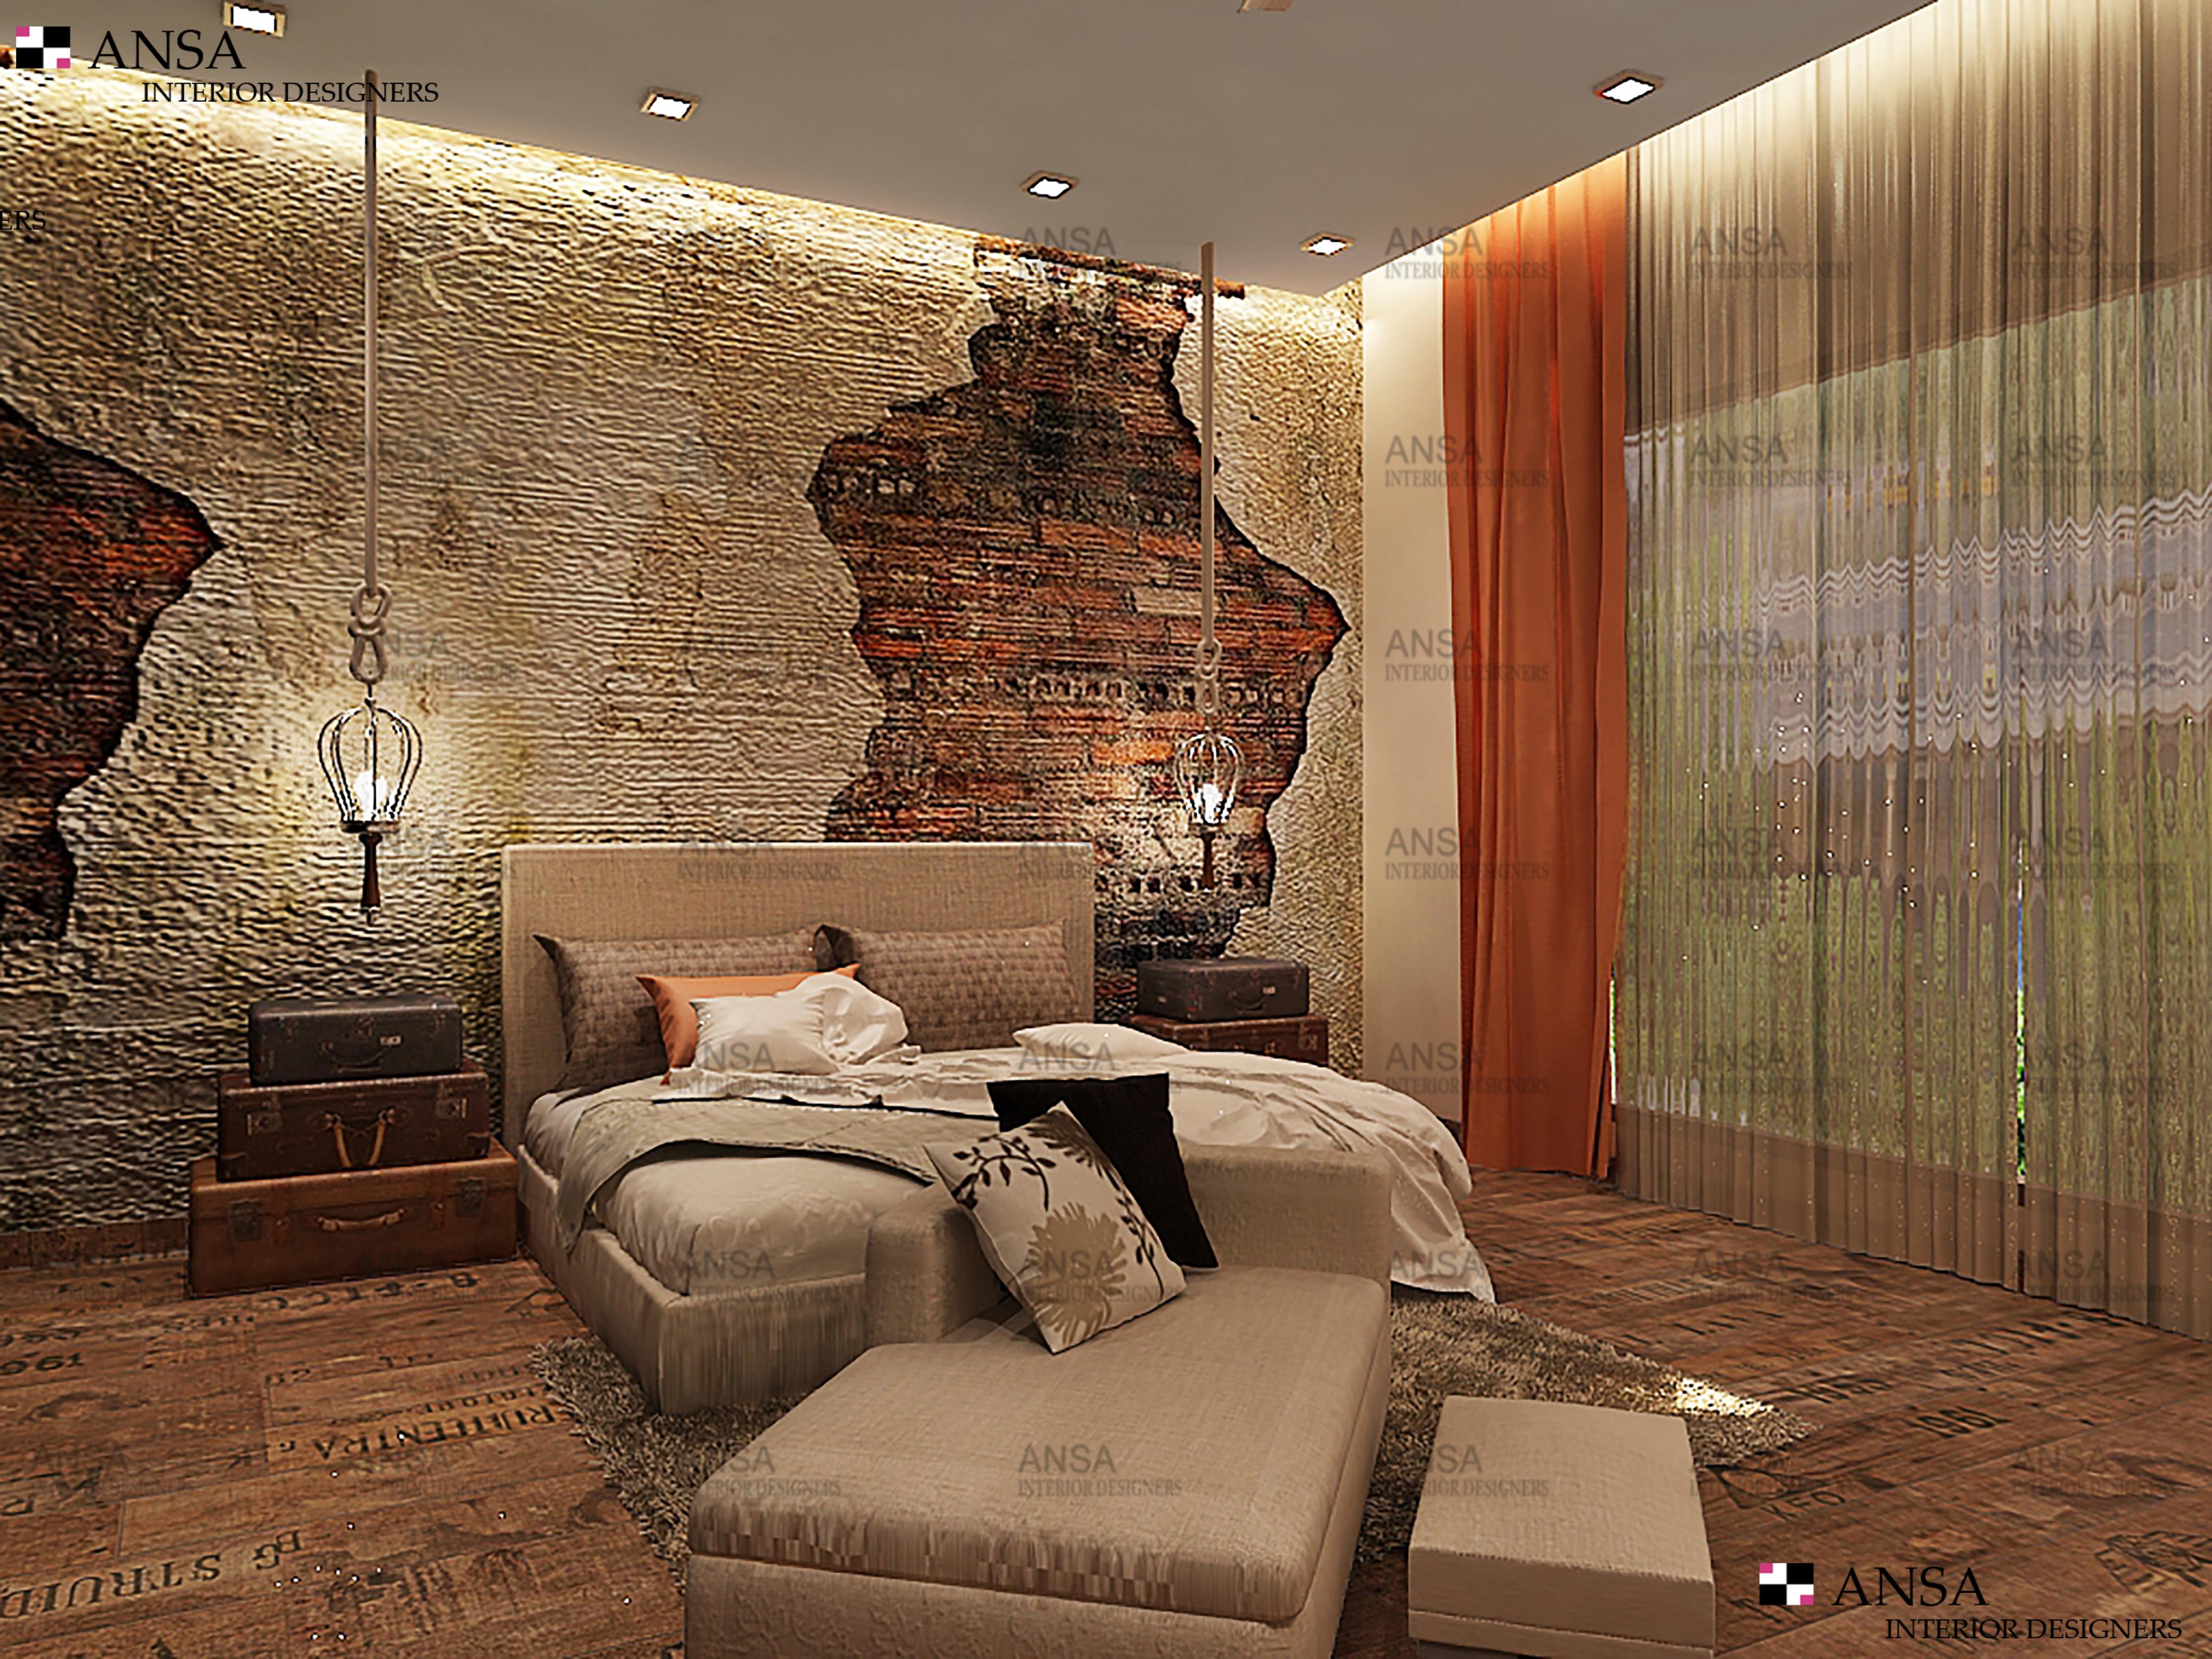 ANSA Interiors